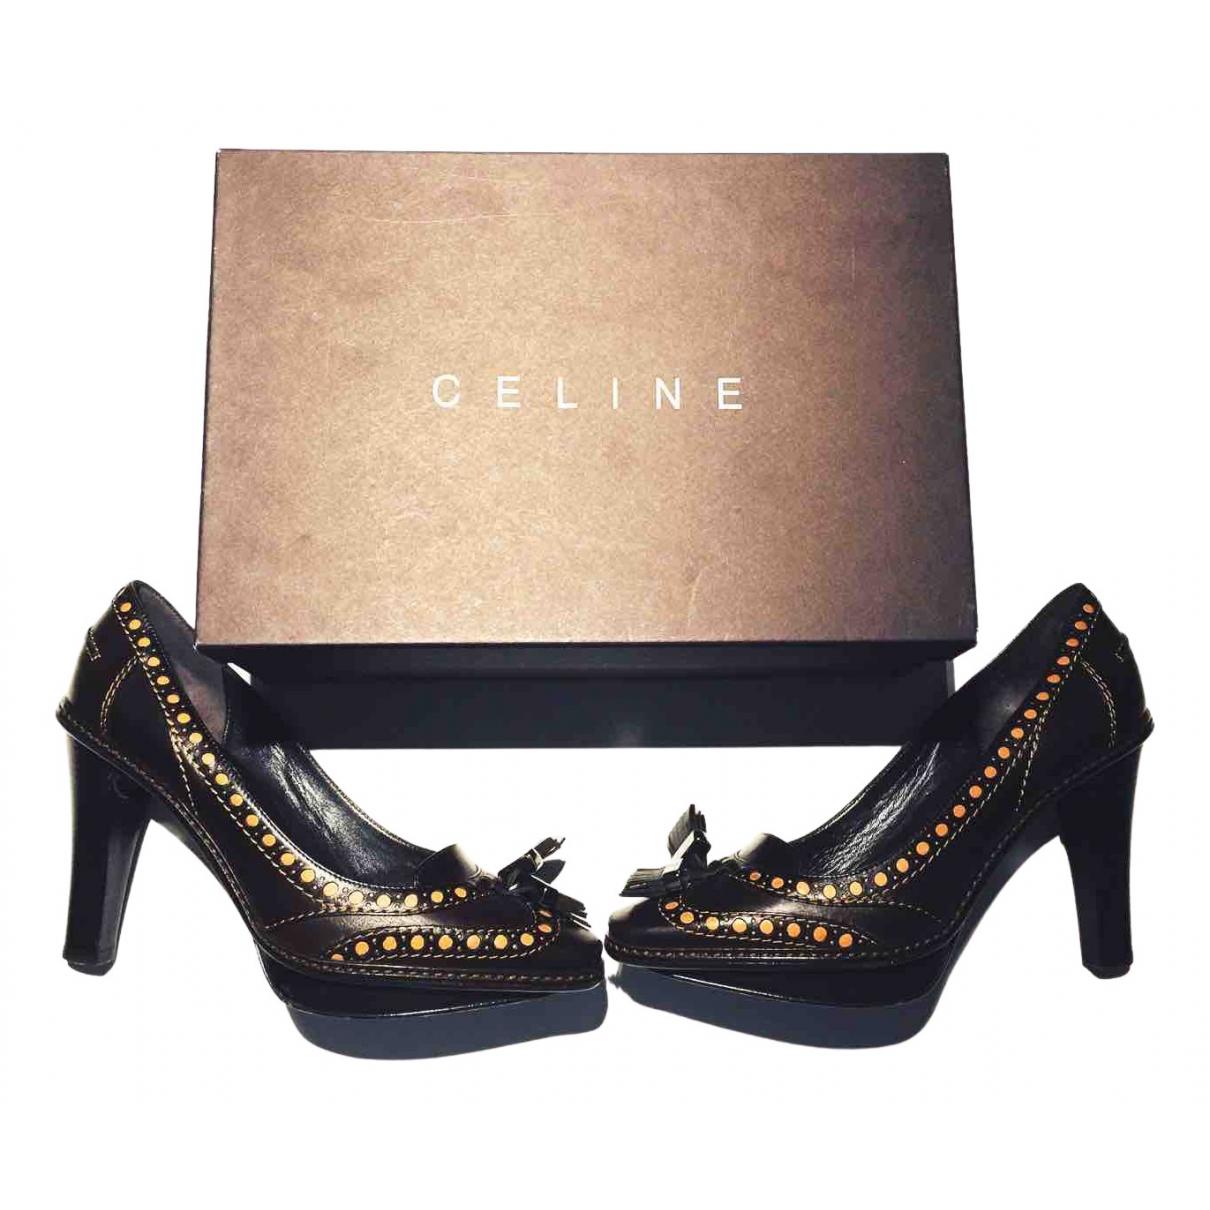 Celine \N Brown Leather Heels for Women 36.5 EU